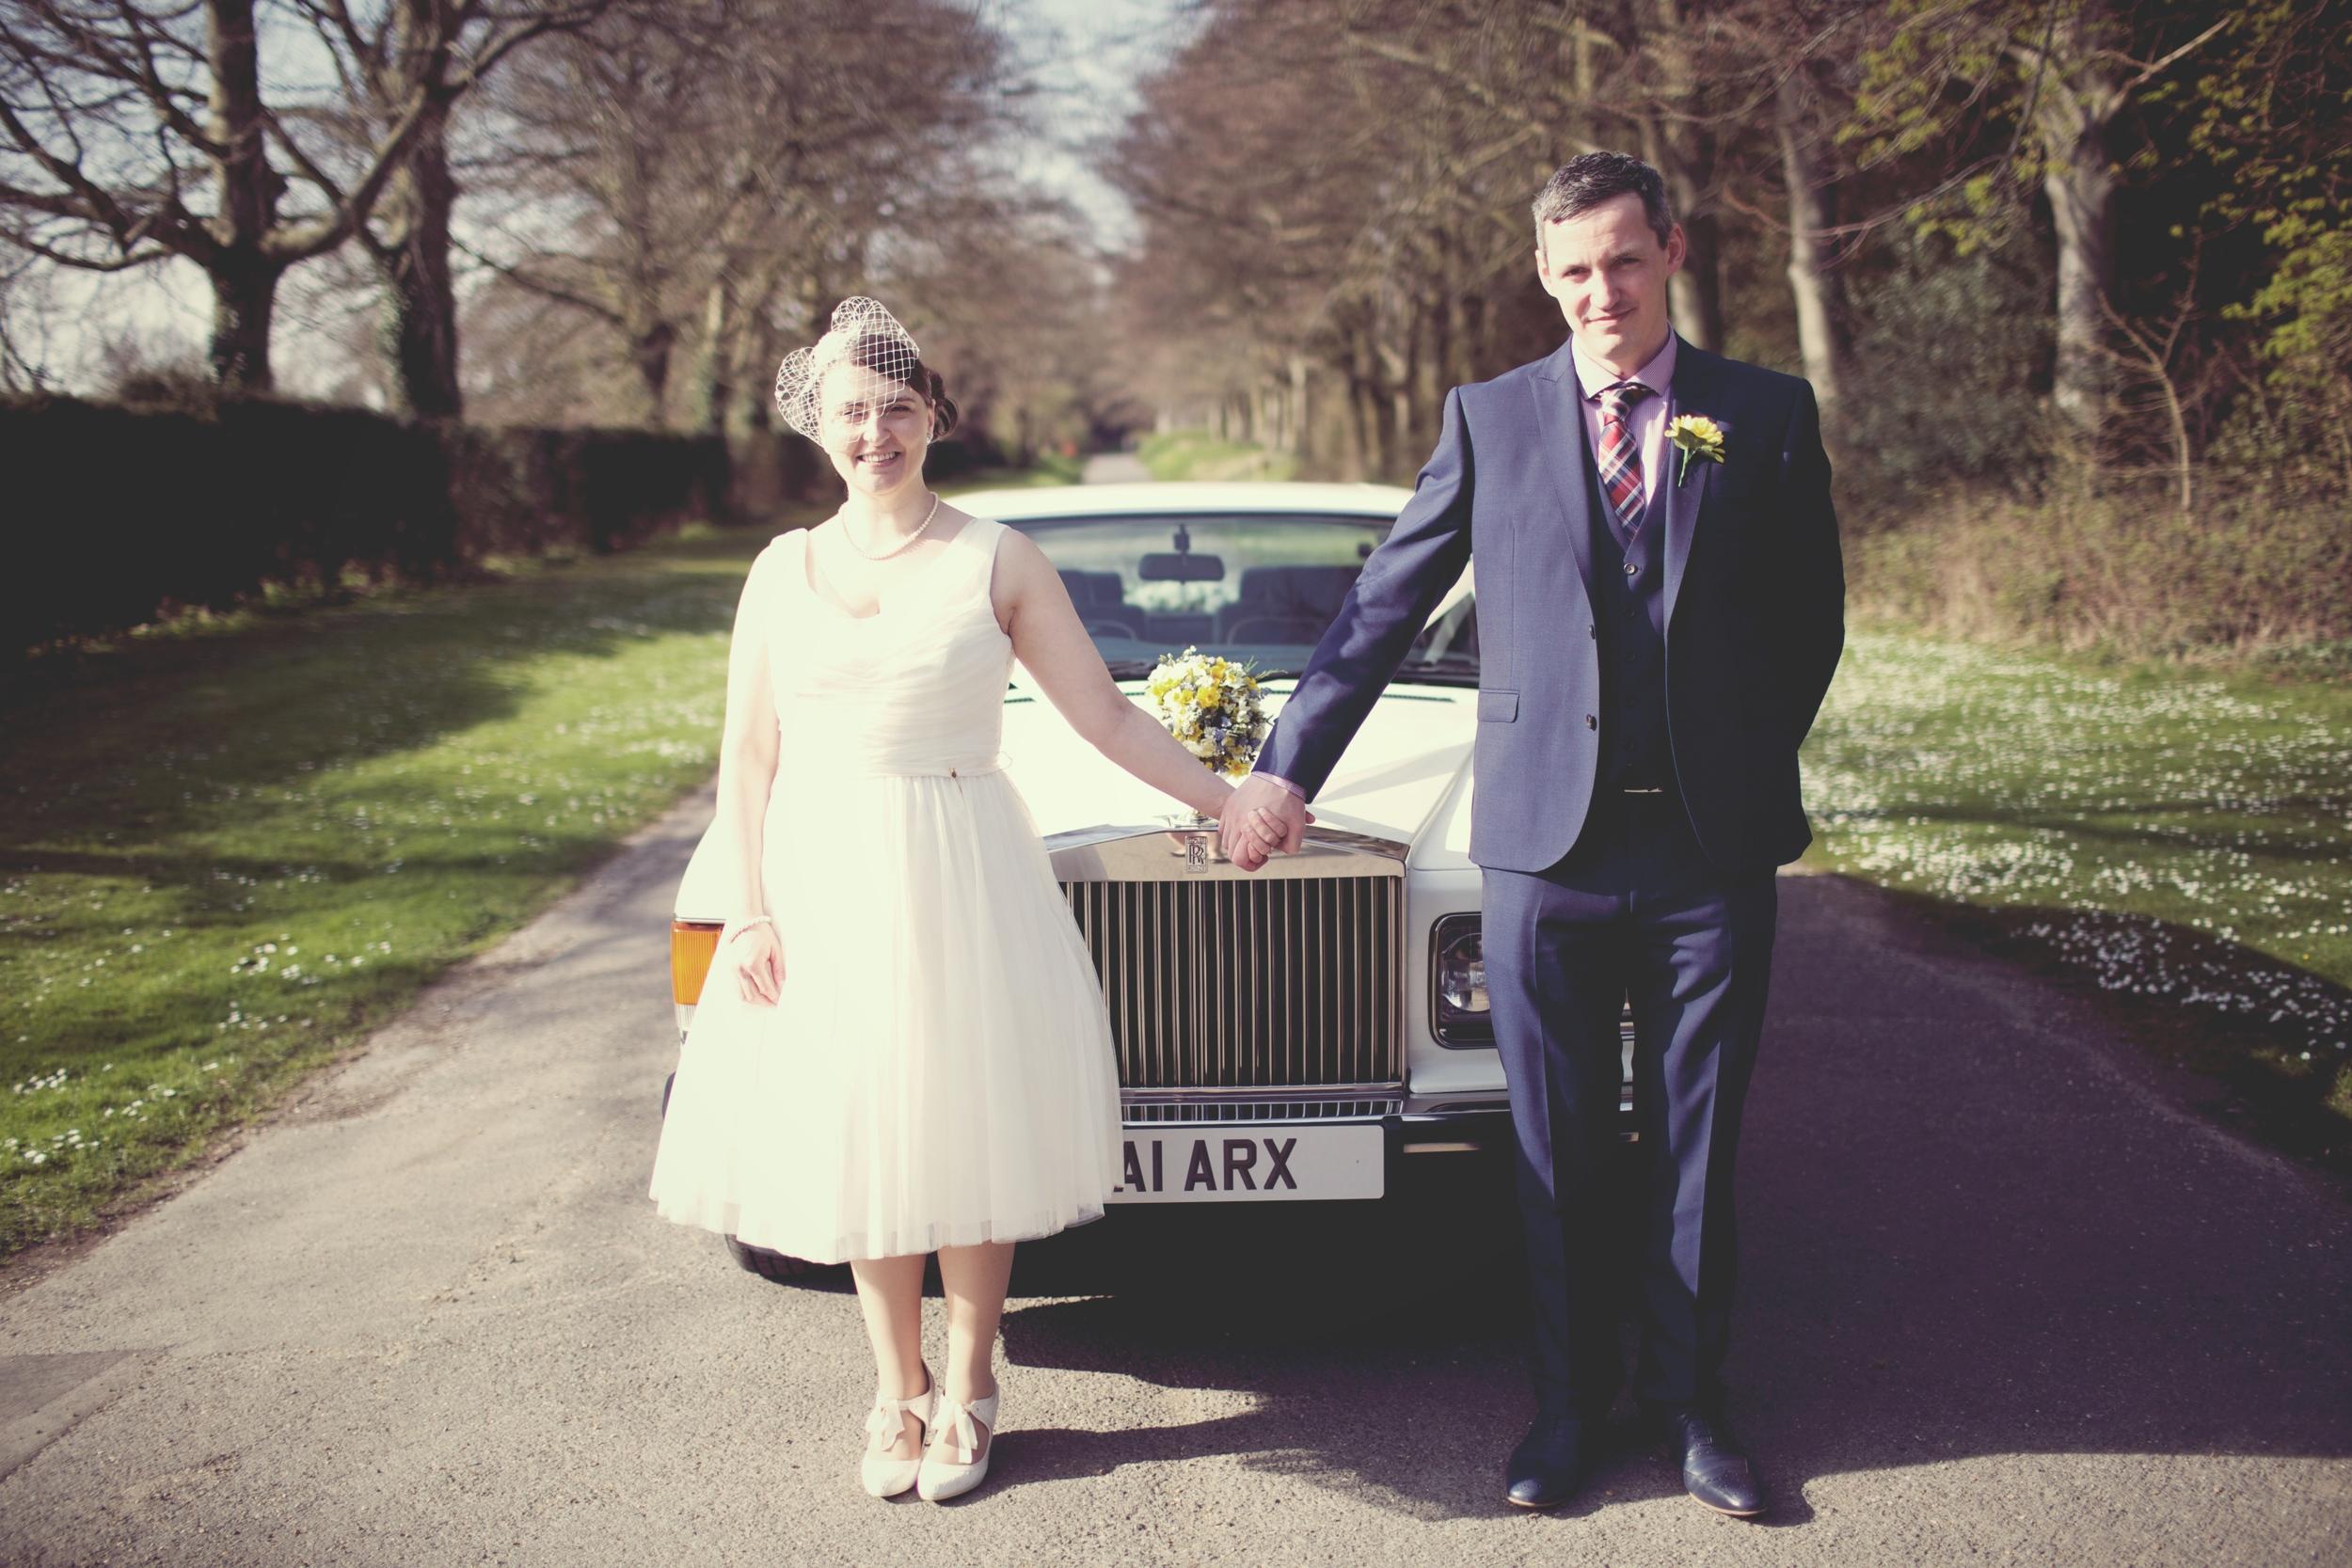 Wedding Photographs in Arundel Park